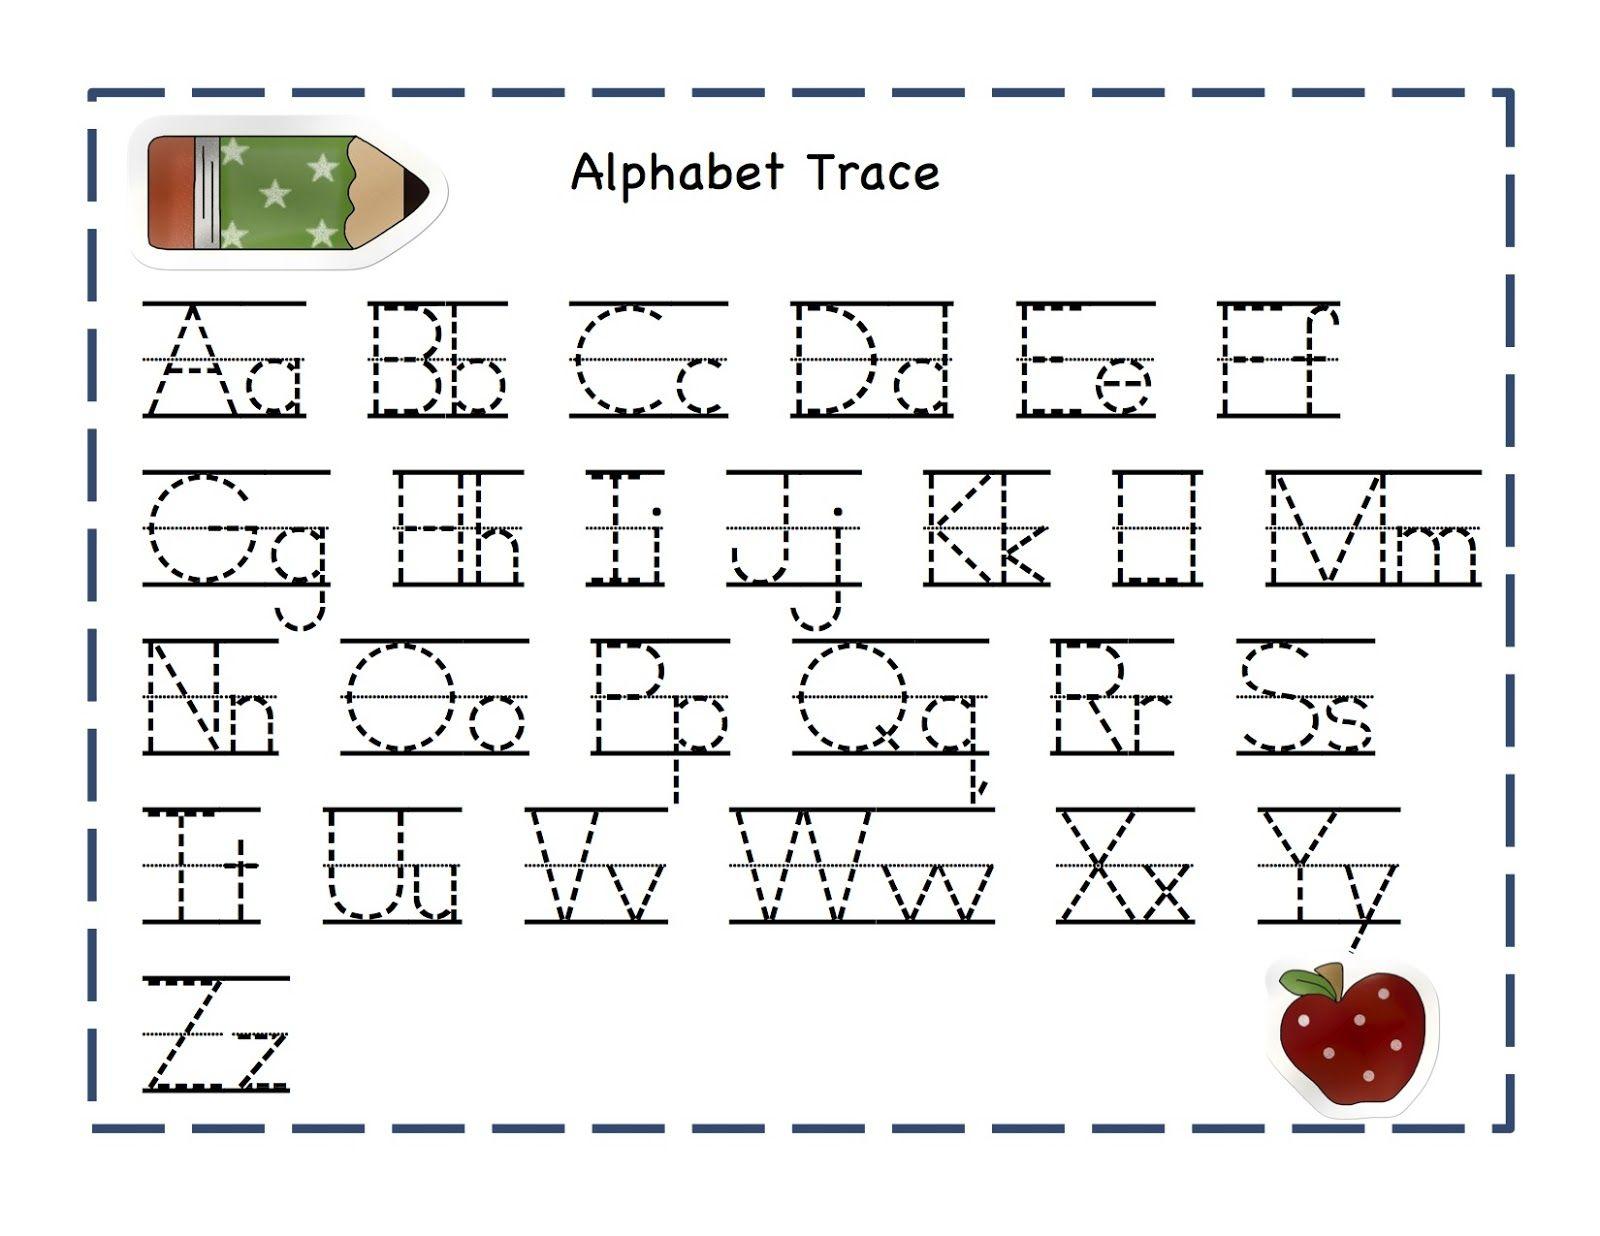 Alphabet Tracing Pages 1 | Alphabet Tracing, Preschool regarding Grade 1 Alphabet Tracing Worksheets